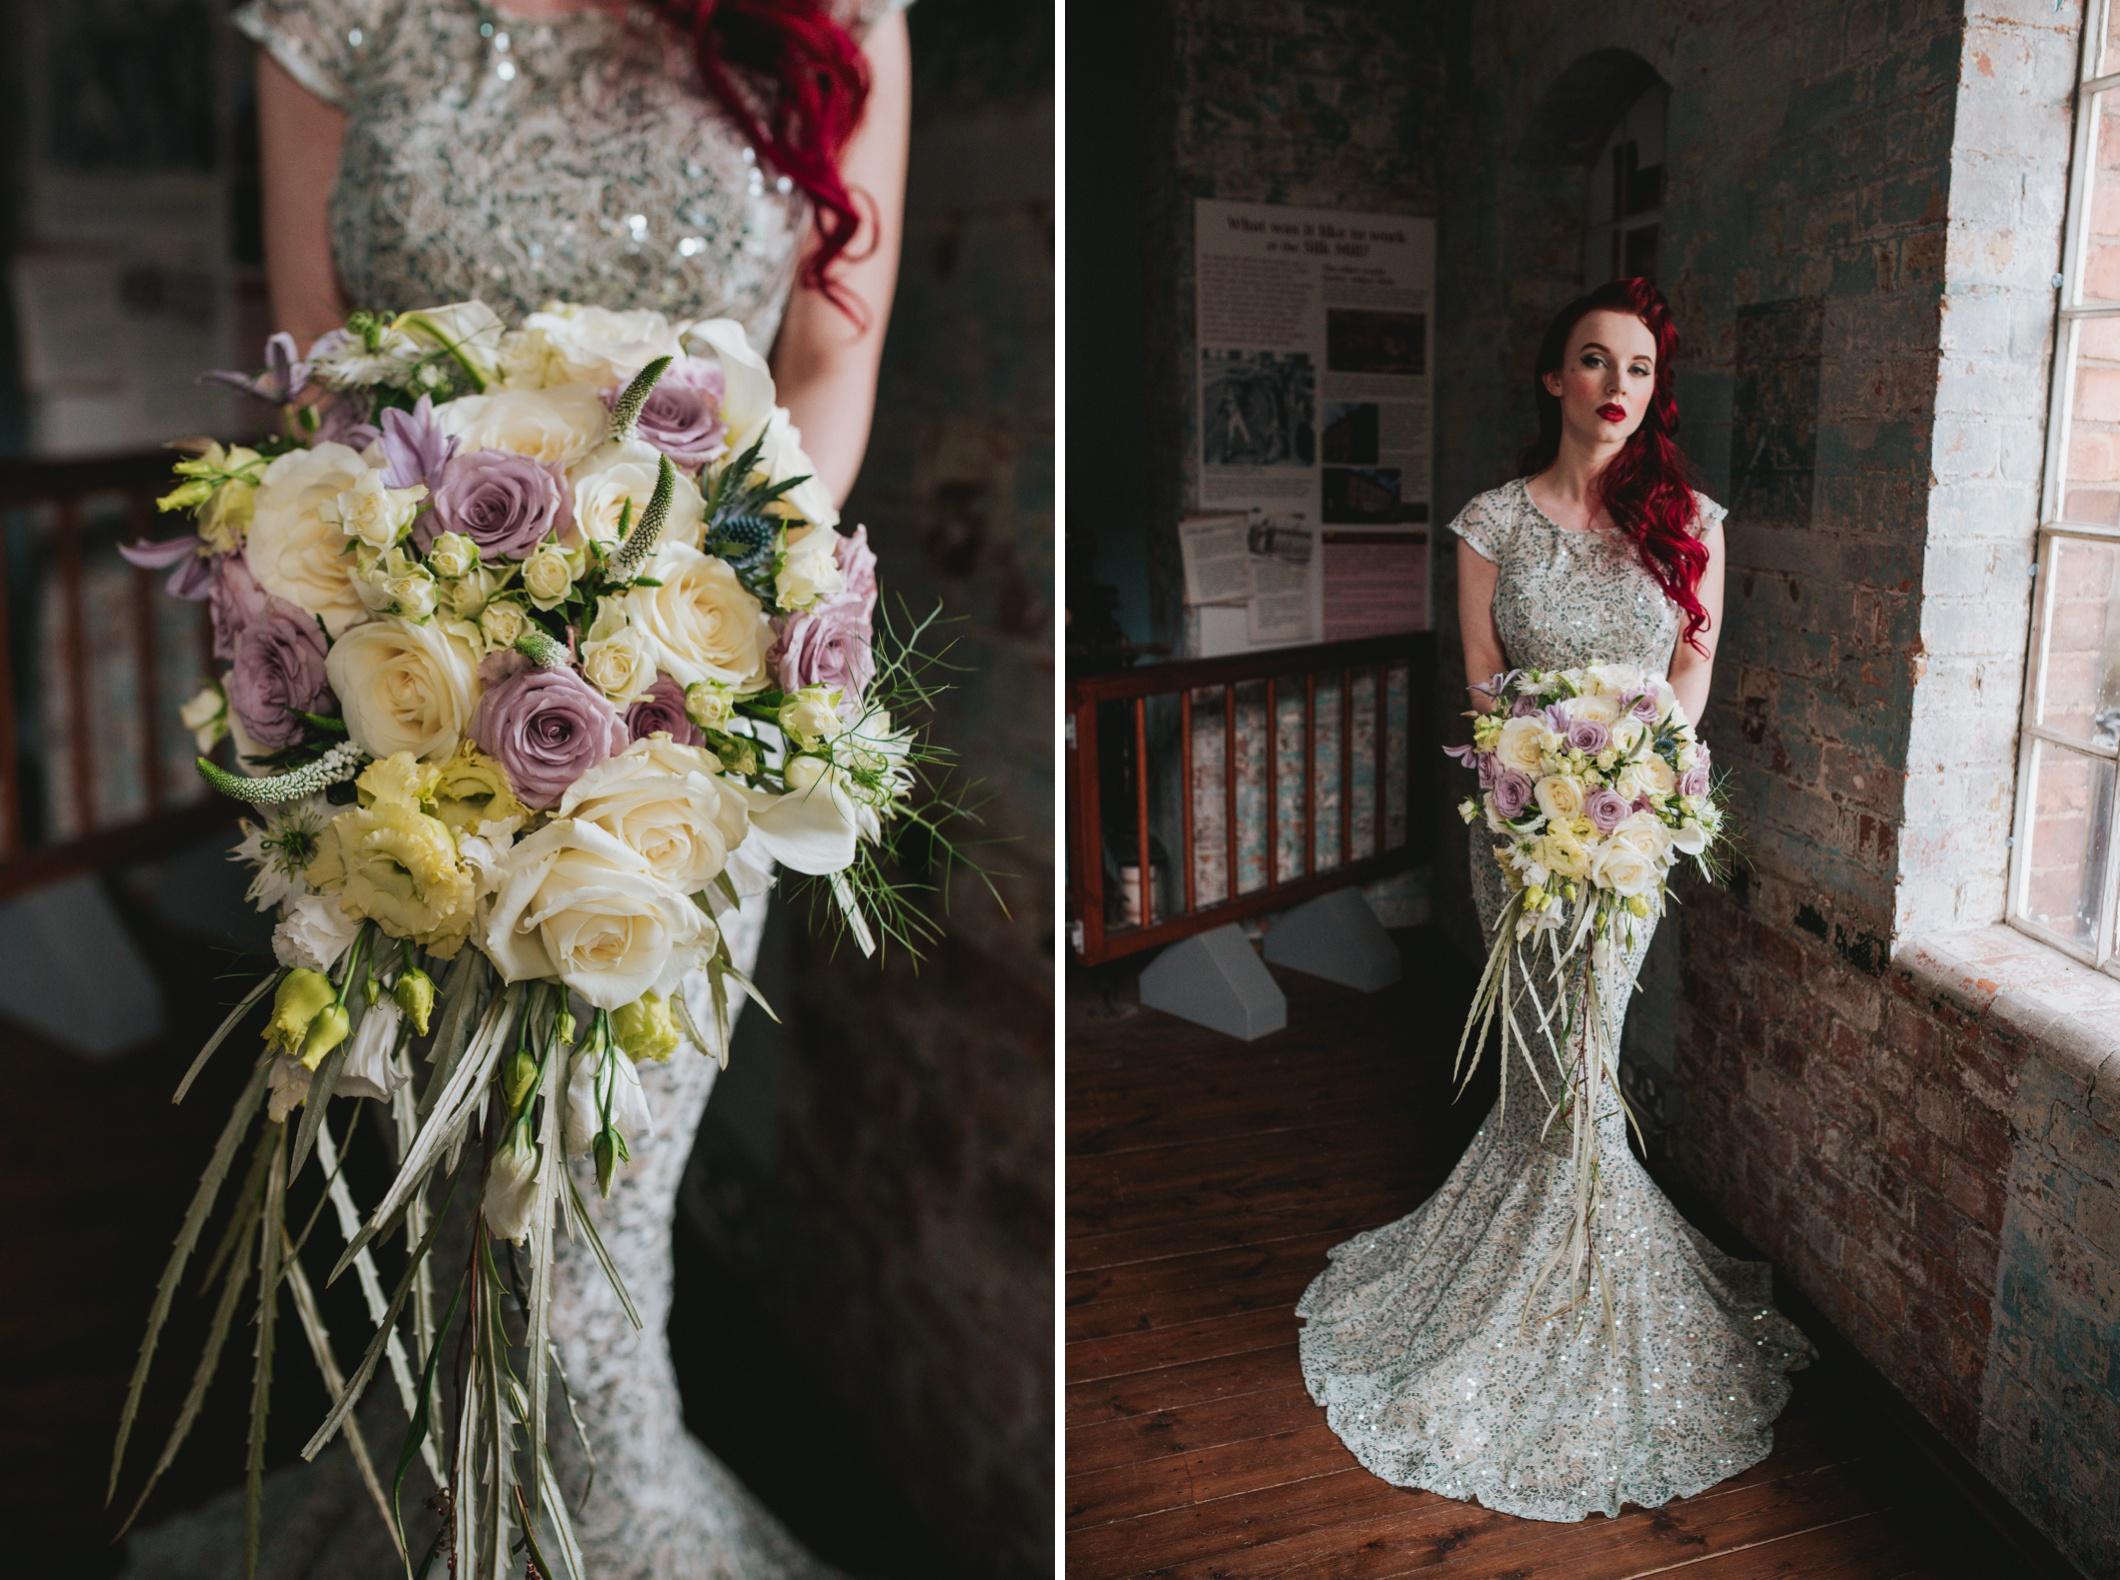 Alternative Wedding Dresses Nottingham : On nottingham alternative wedding and fairytale weddings